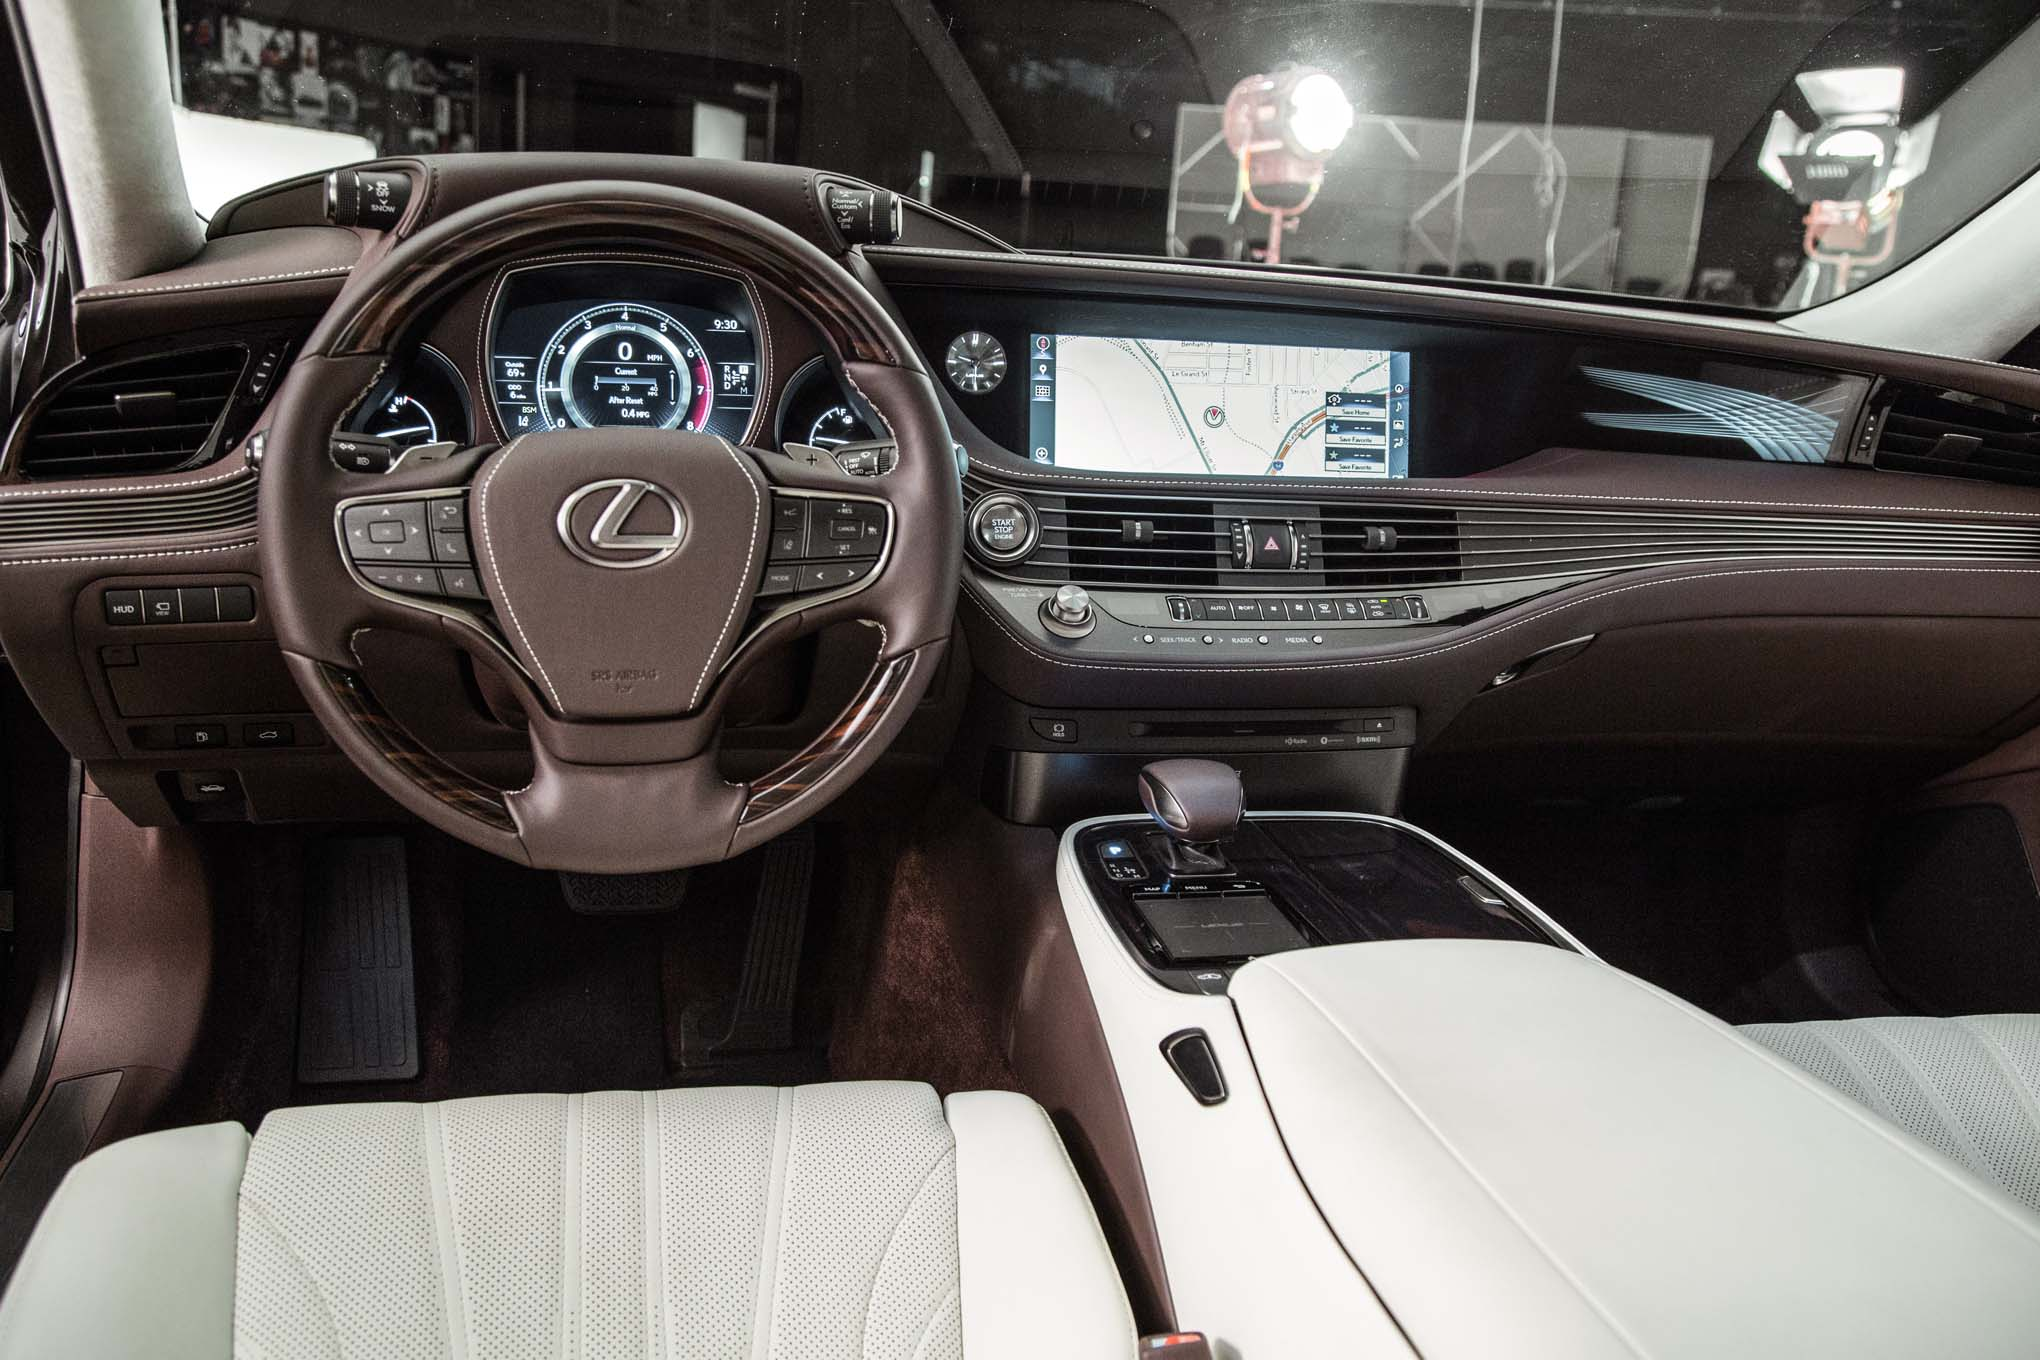 https://st.automobilemag.com/uploads/sites/11/2017/02/2018-Lexus-LS-500-cockpit.jpg